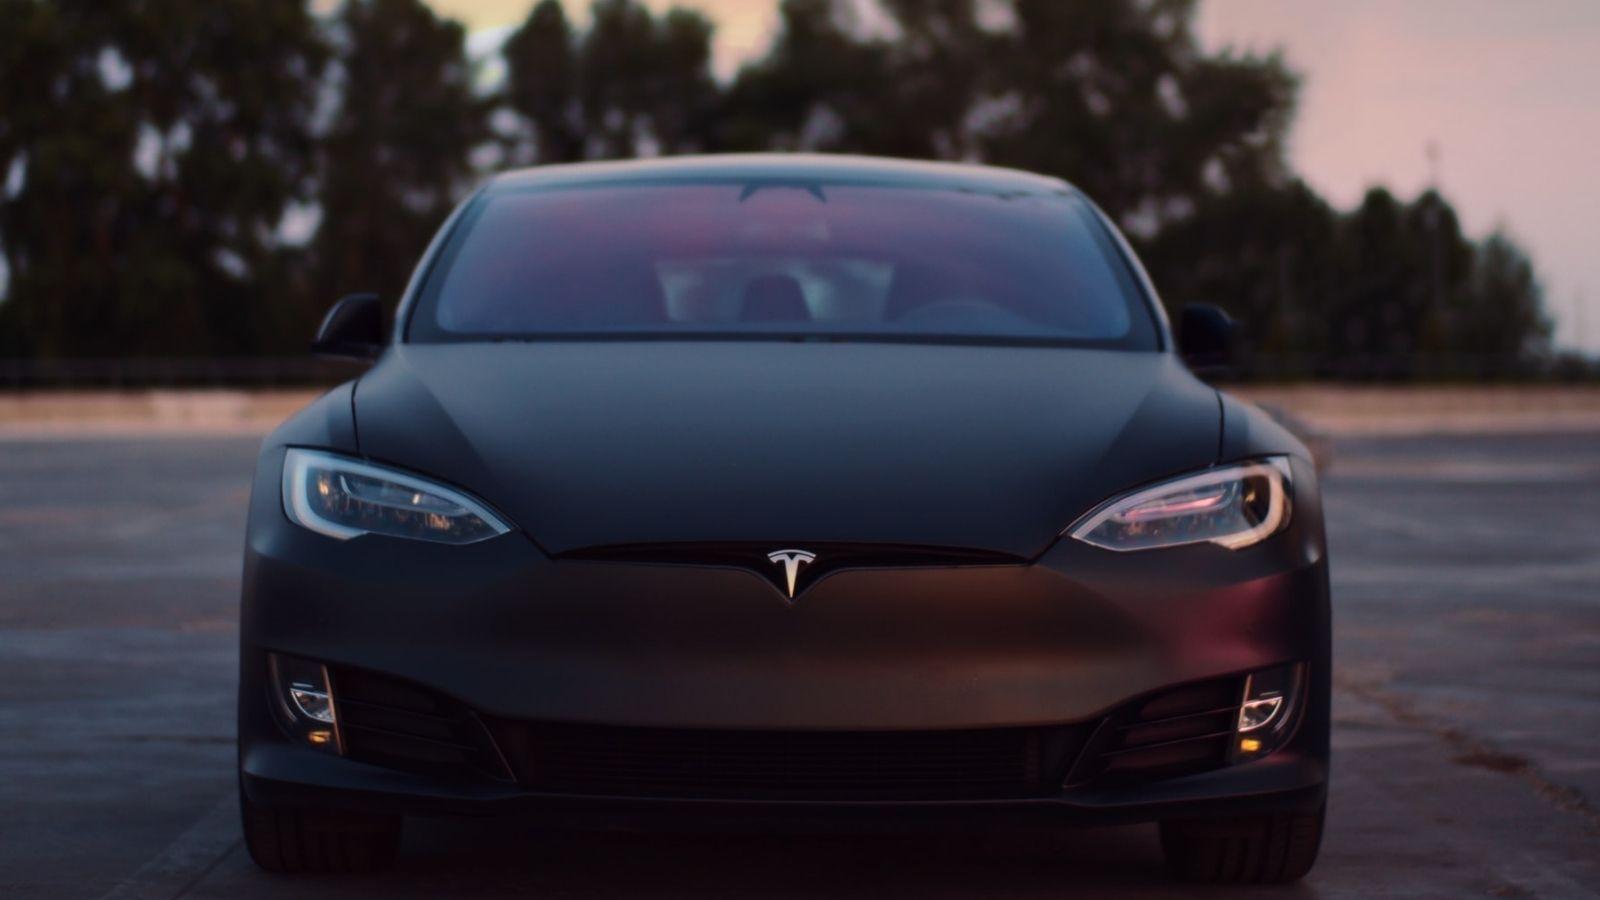 Tesla Model S Car Black